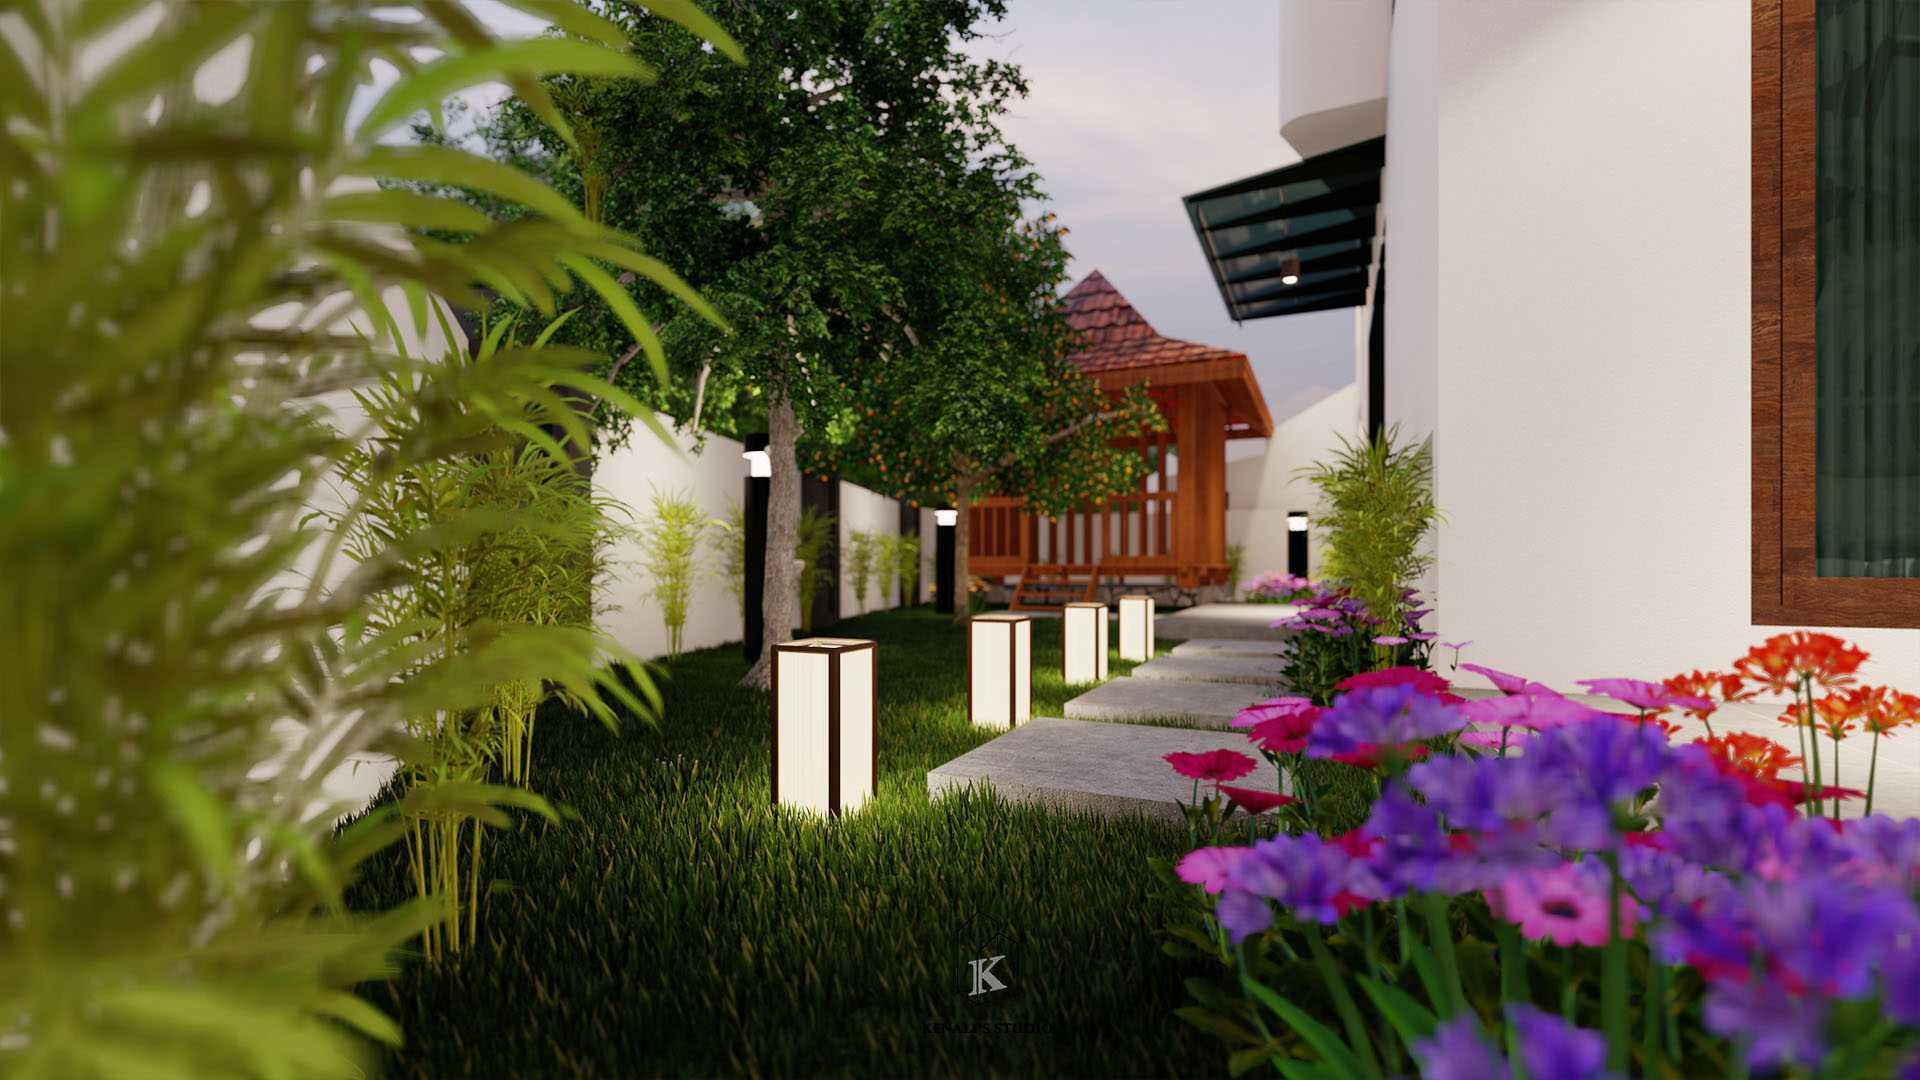 Kenali's Studio Yr - House Kec. Serpong, Kota Tangerang Selatan, Banten, Indonesia Kec. Serpong, Kota Tangerang Selatan, Banten, Indonesia Kenalis-Studio-Yr-House   93647